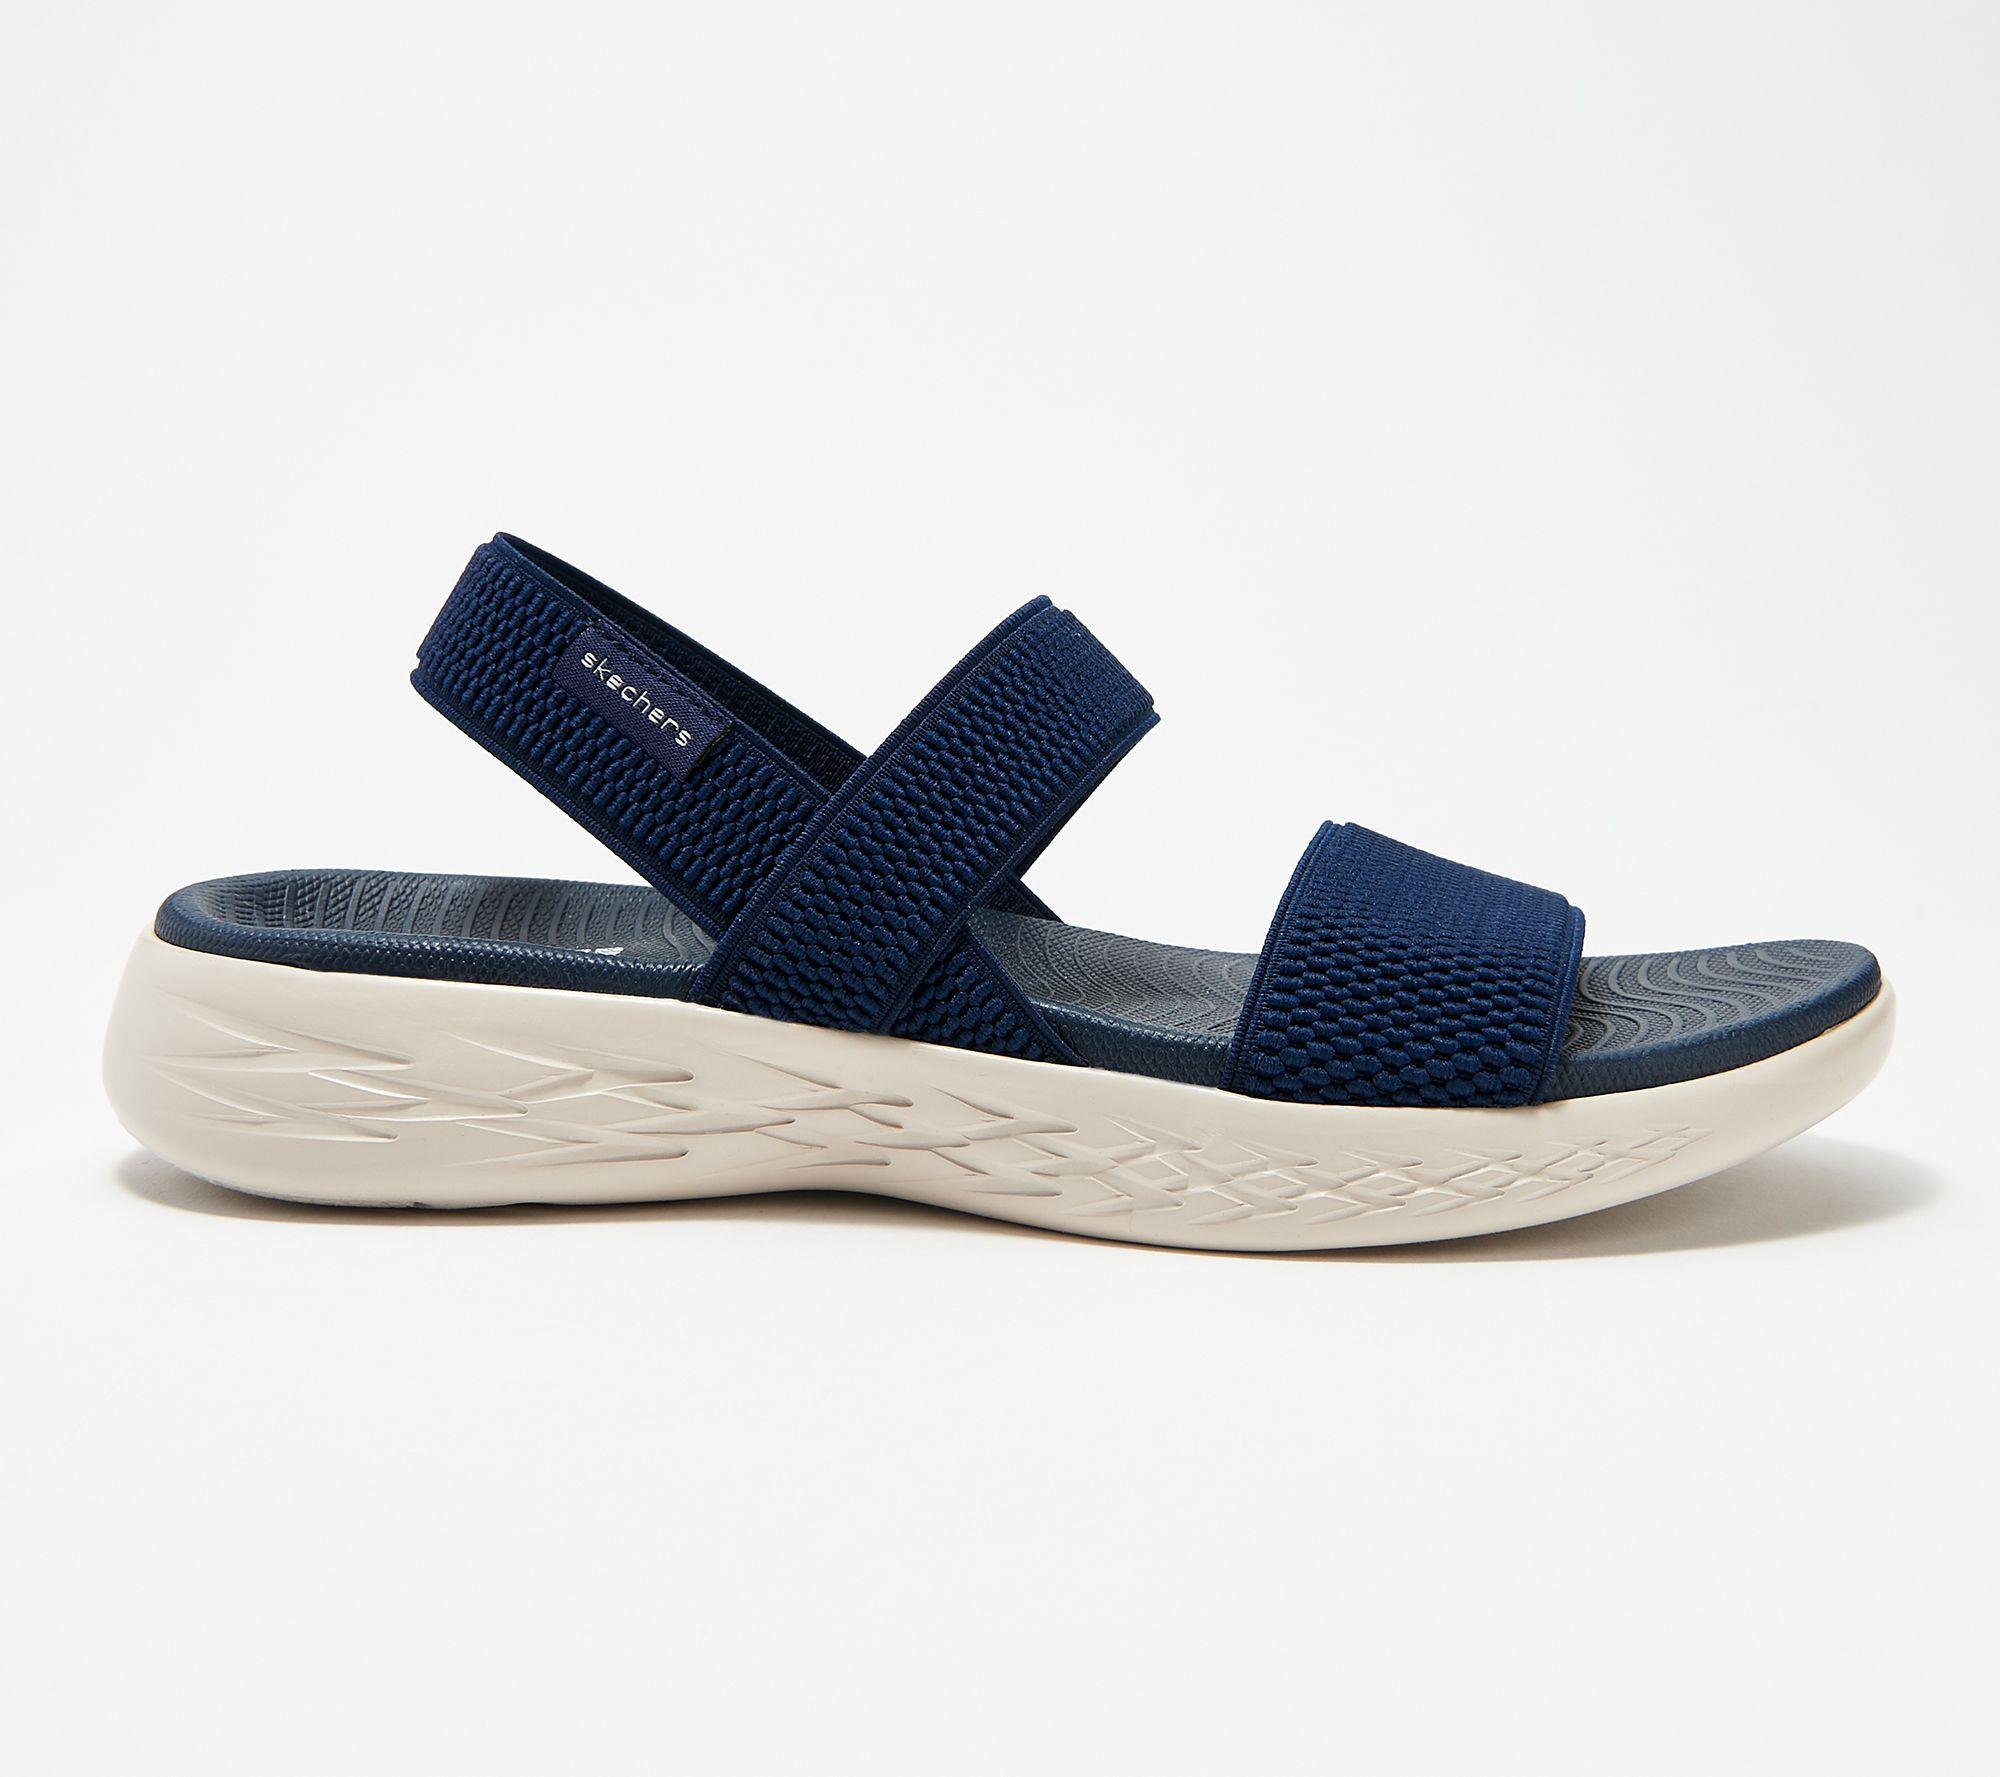 skechers slippers reviews